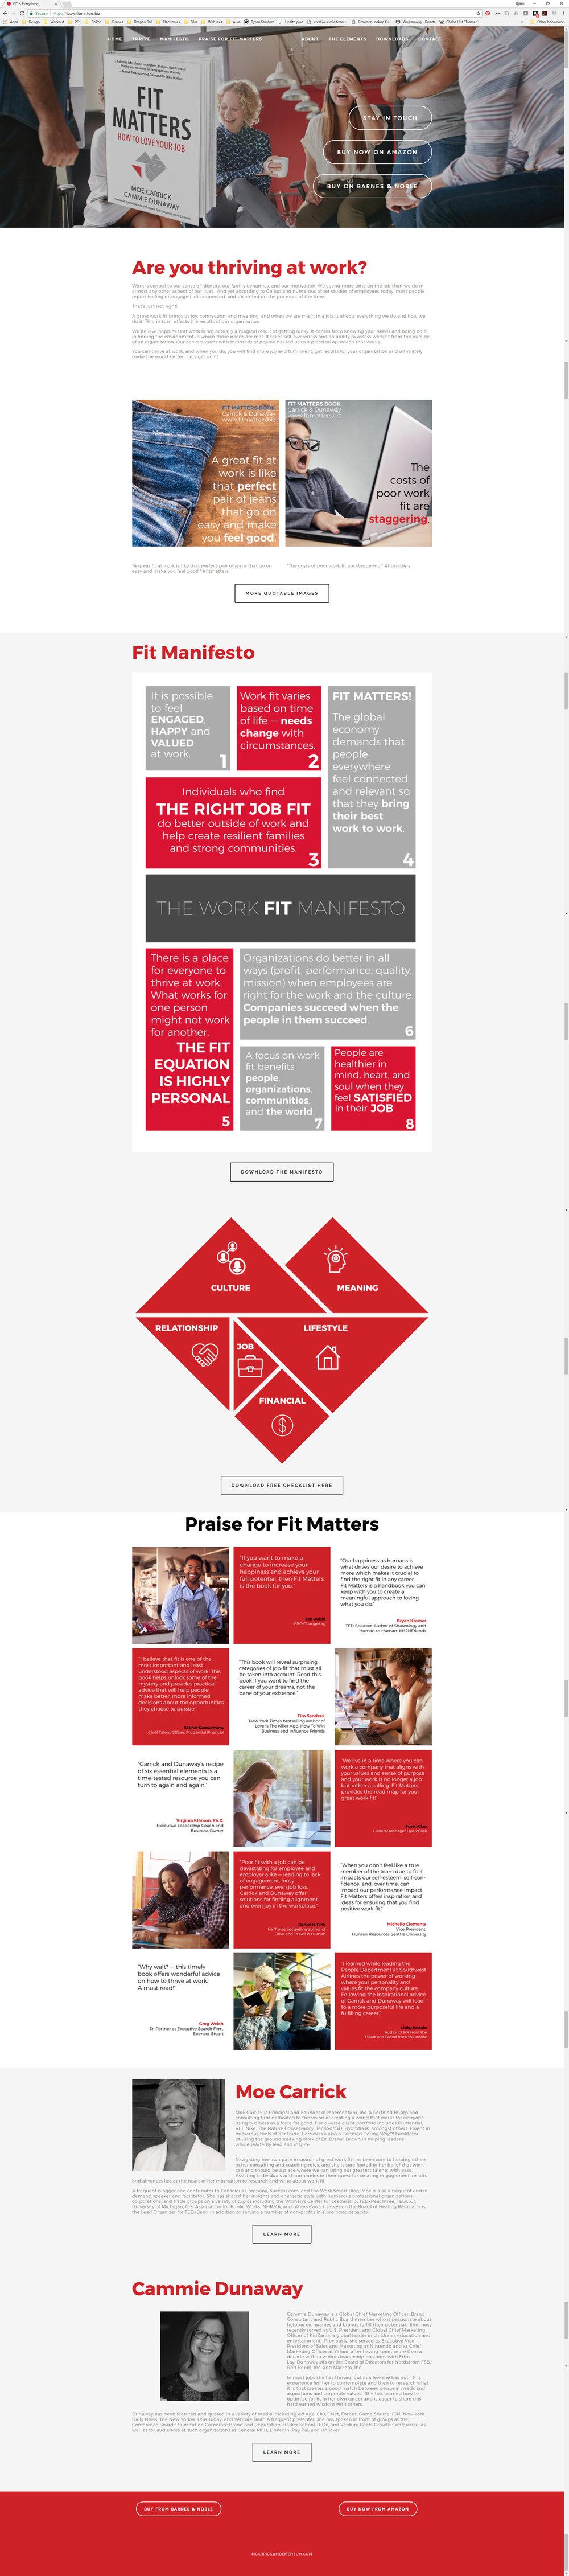 Fit+matters+web.jpg